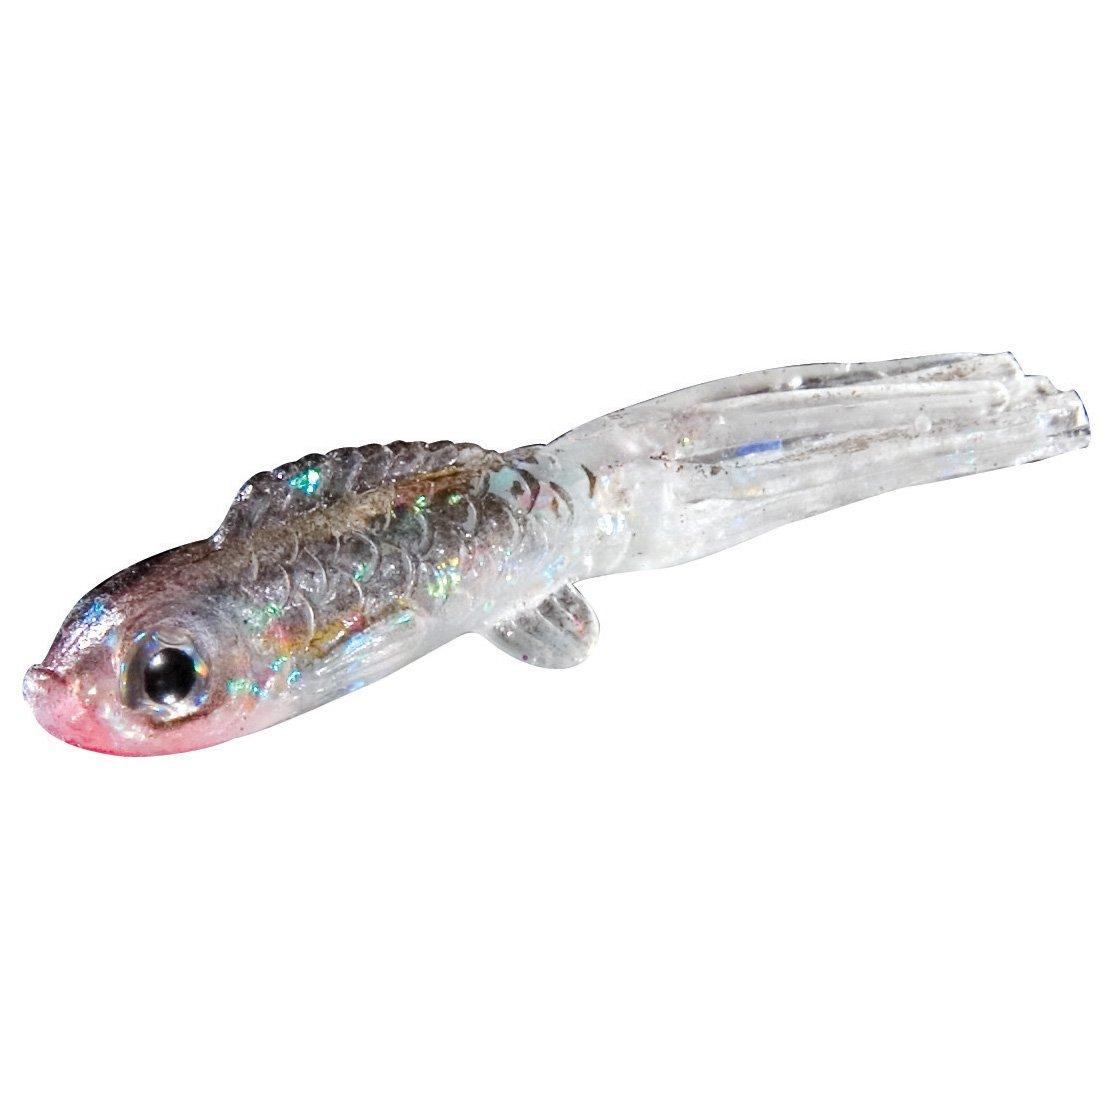 "Northland Tackle ST1P-26 Slurpies Smally 11/2"" Cd Slurpies Smally, Super-Glow Sunfish, 1.5 oz"